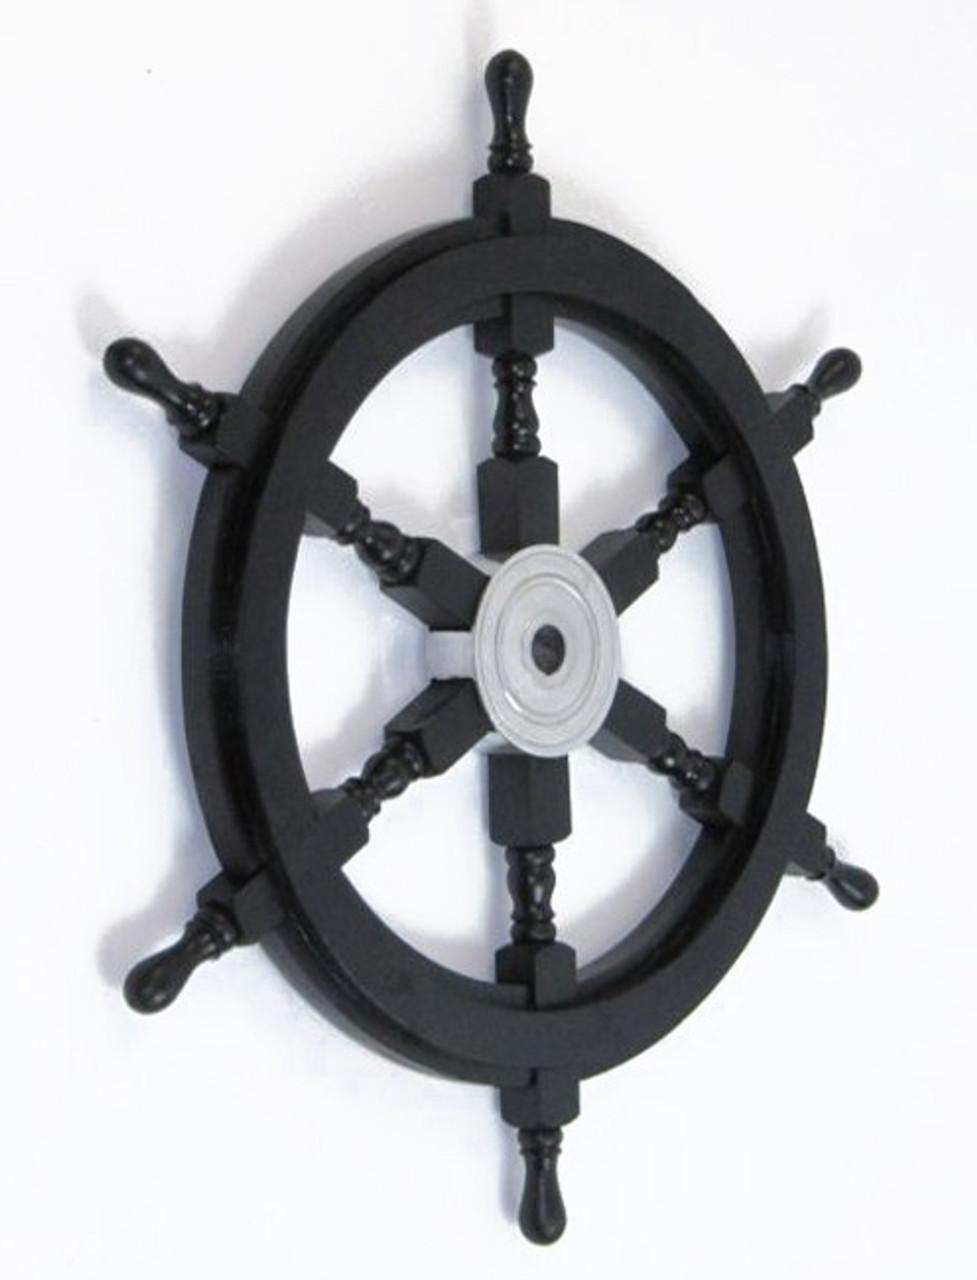 Black Nautical Pirate Ship's Steering Wheel Wooden